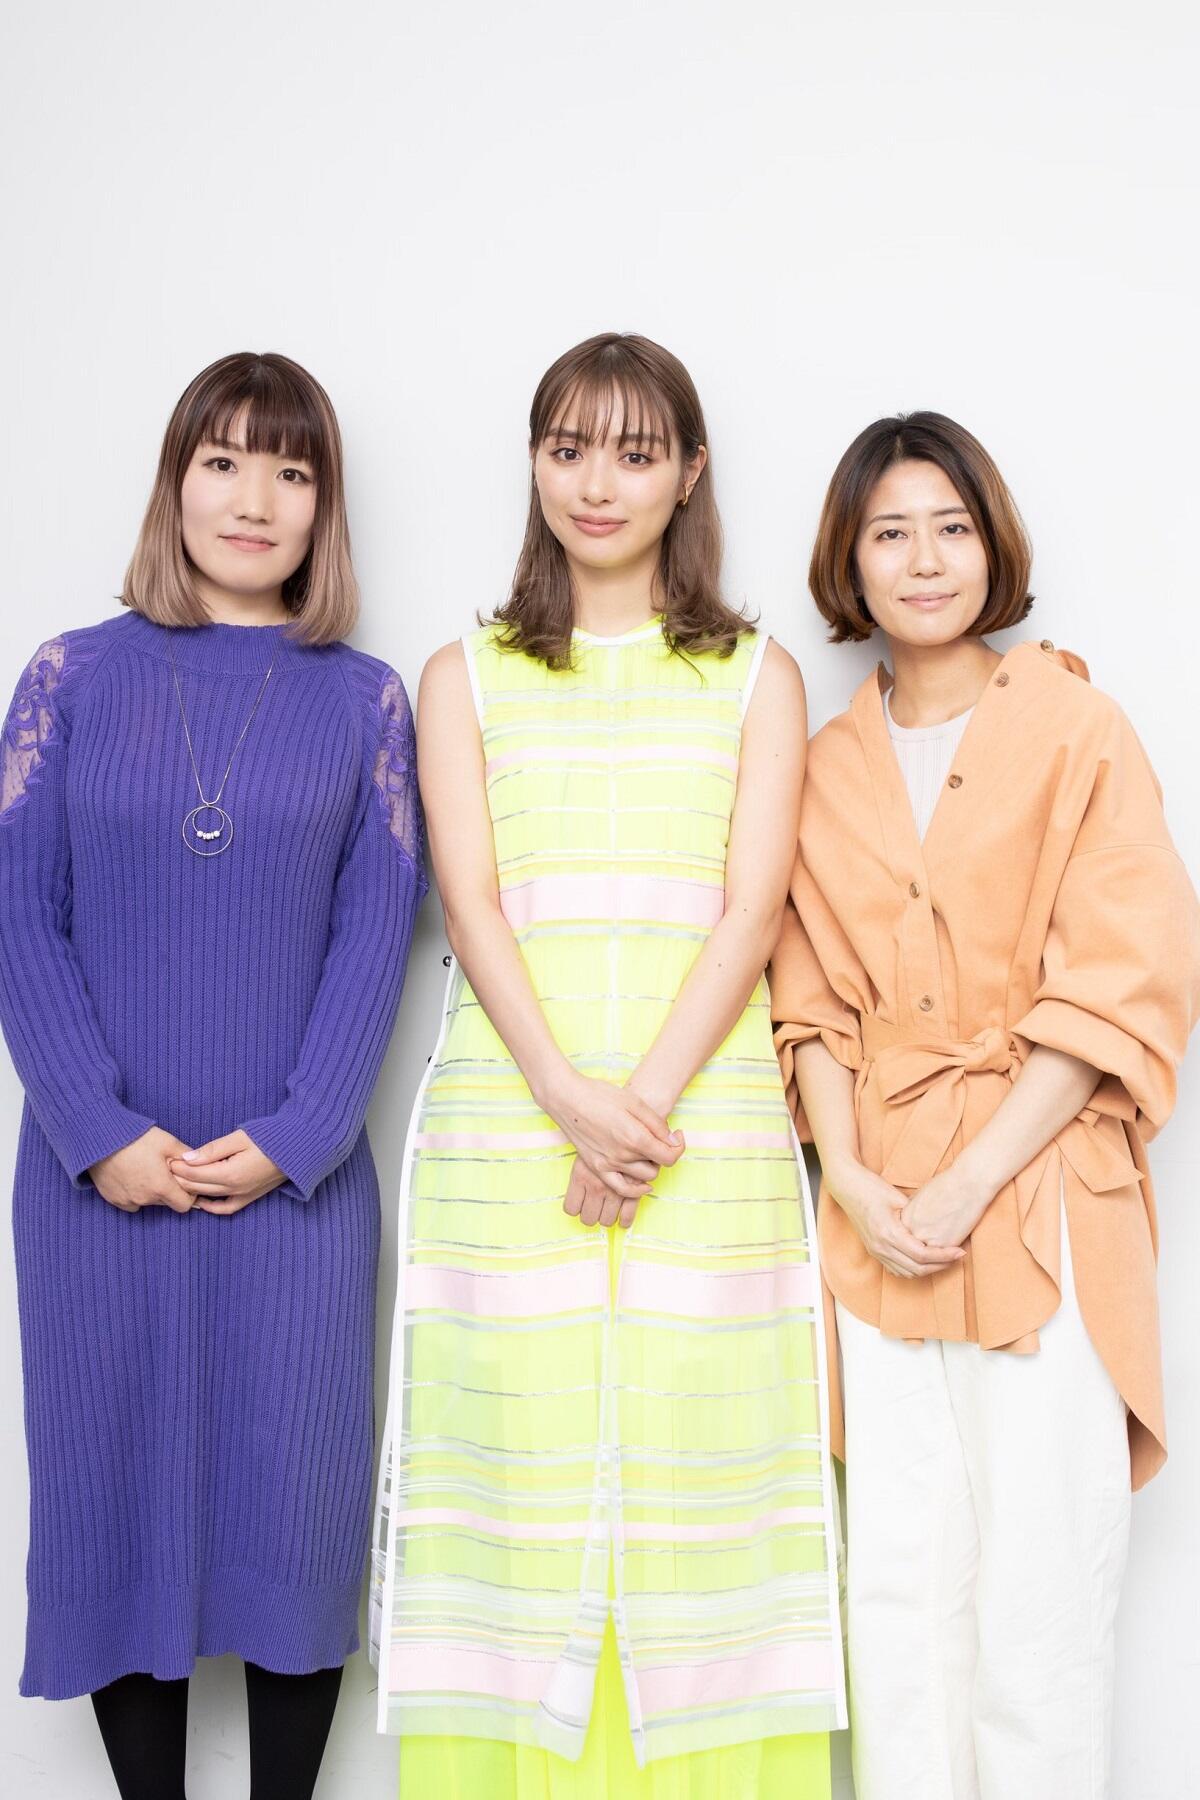 20200213_taidan_02.JPG